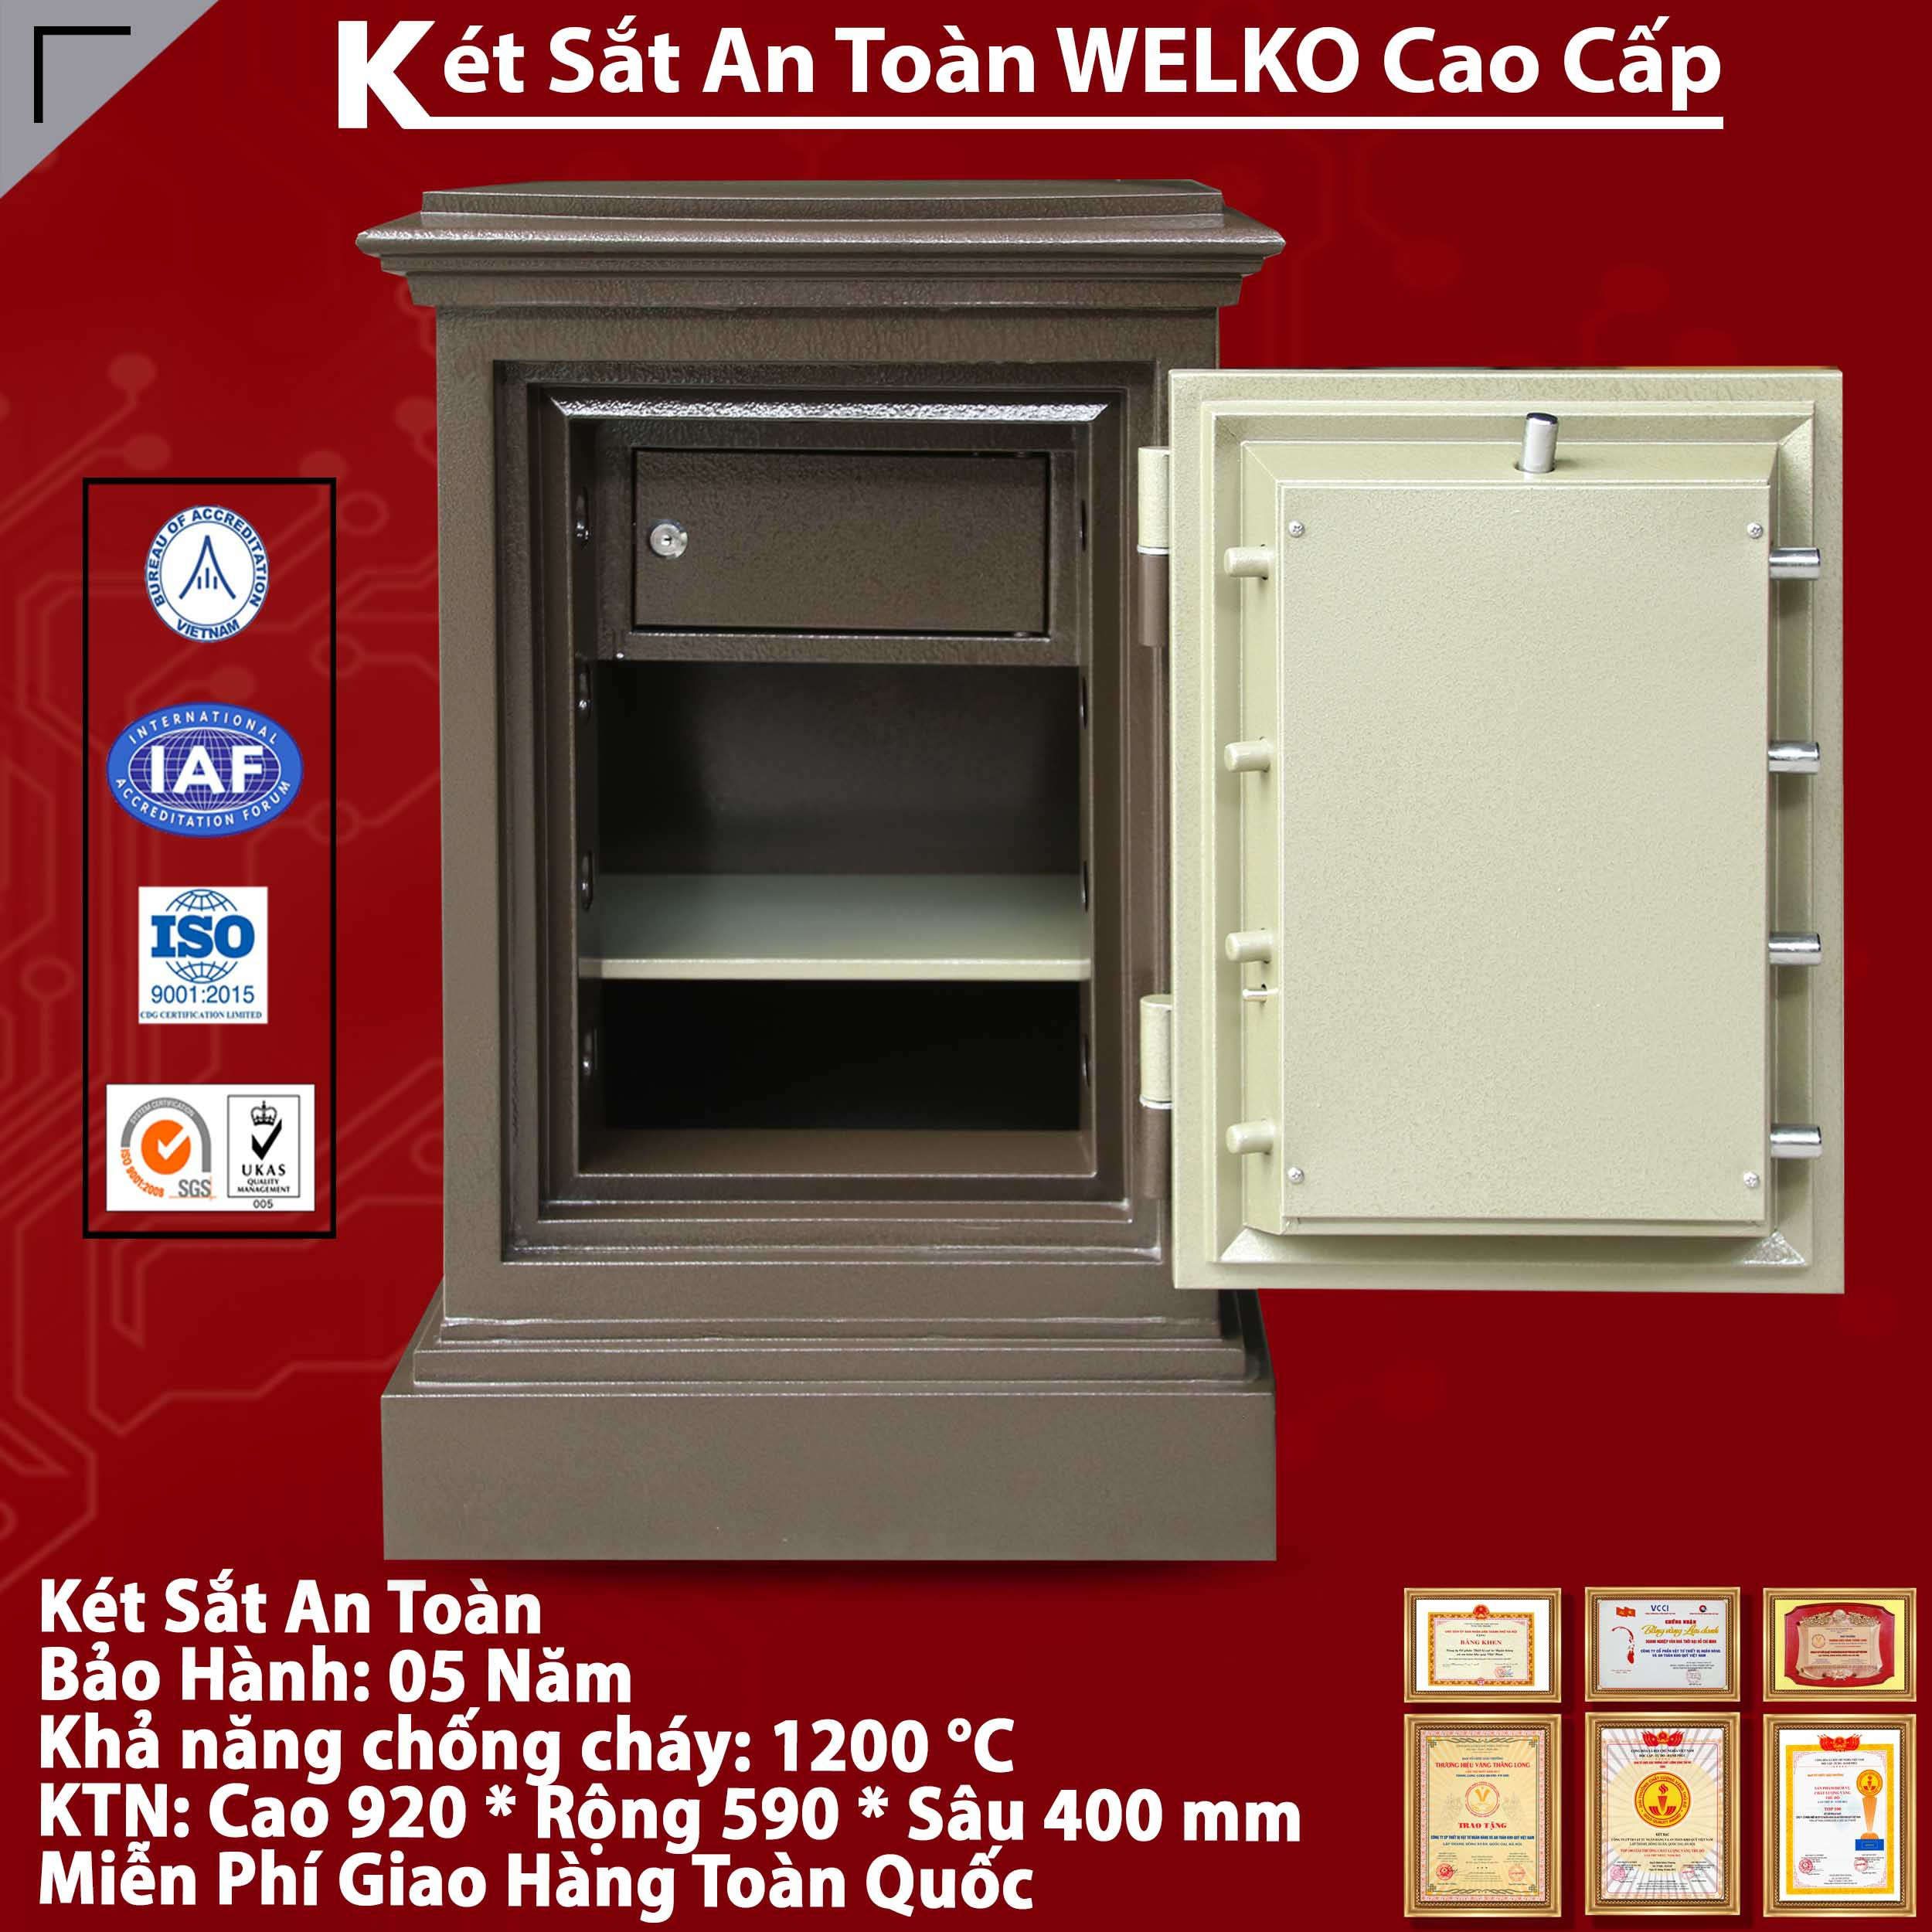 Ket Sat Khoa Van Tay Chat Luong Cao